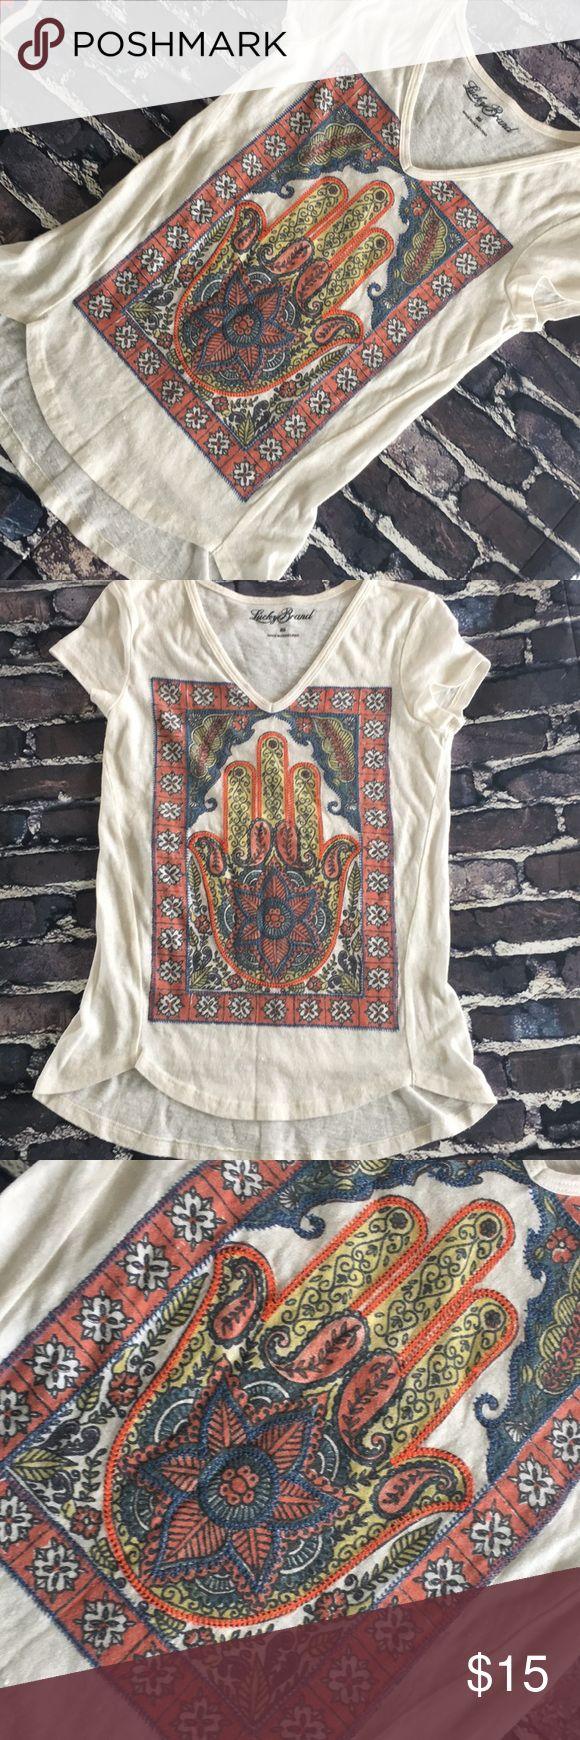 Hamsa Bohemian blouse size xs #hamsa #hippie #boho #yoga #peaceful #festival #unique top great condtion size xs bundle & save $$$$ Tilly's Tops Blouses